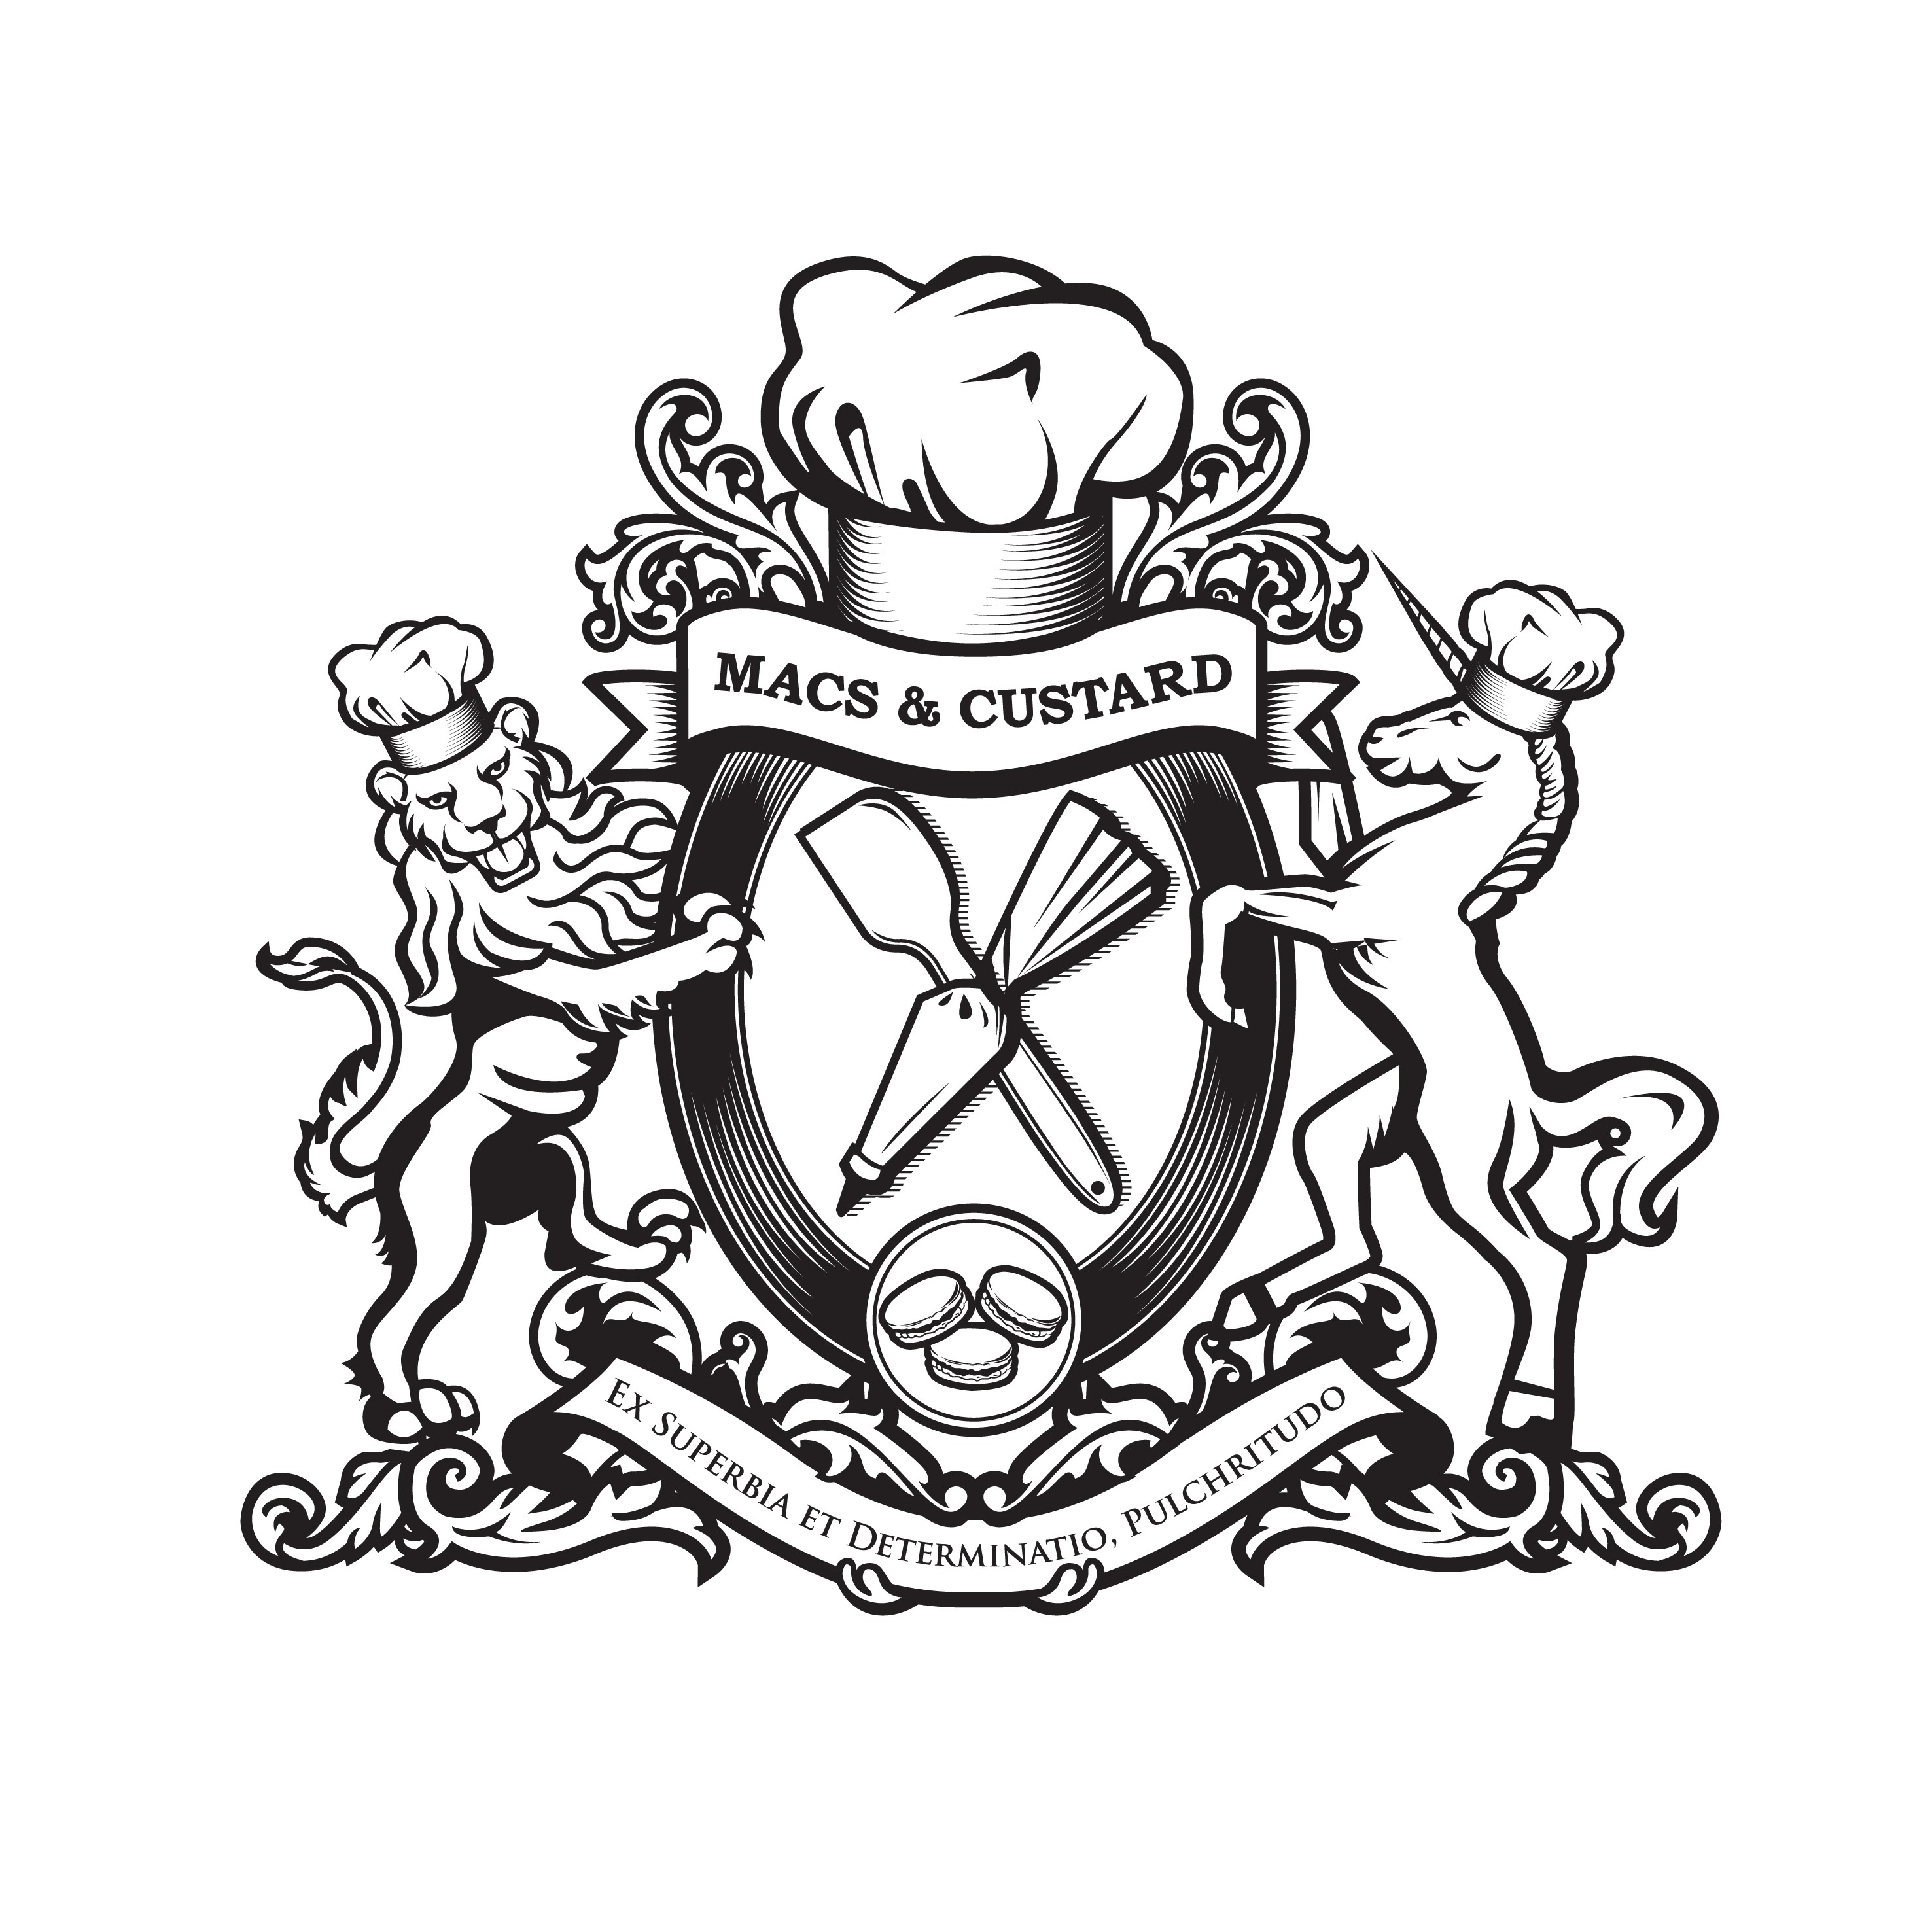 Macs & Custard logo design